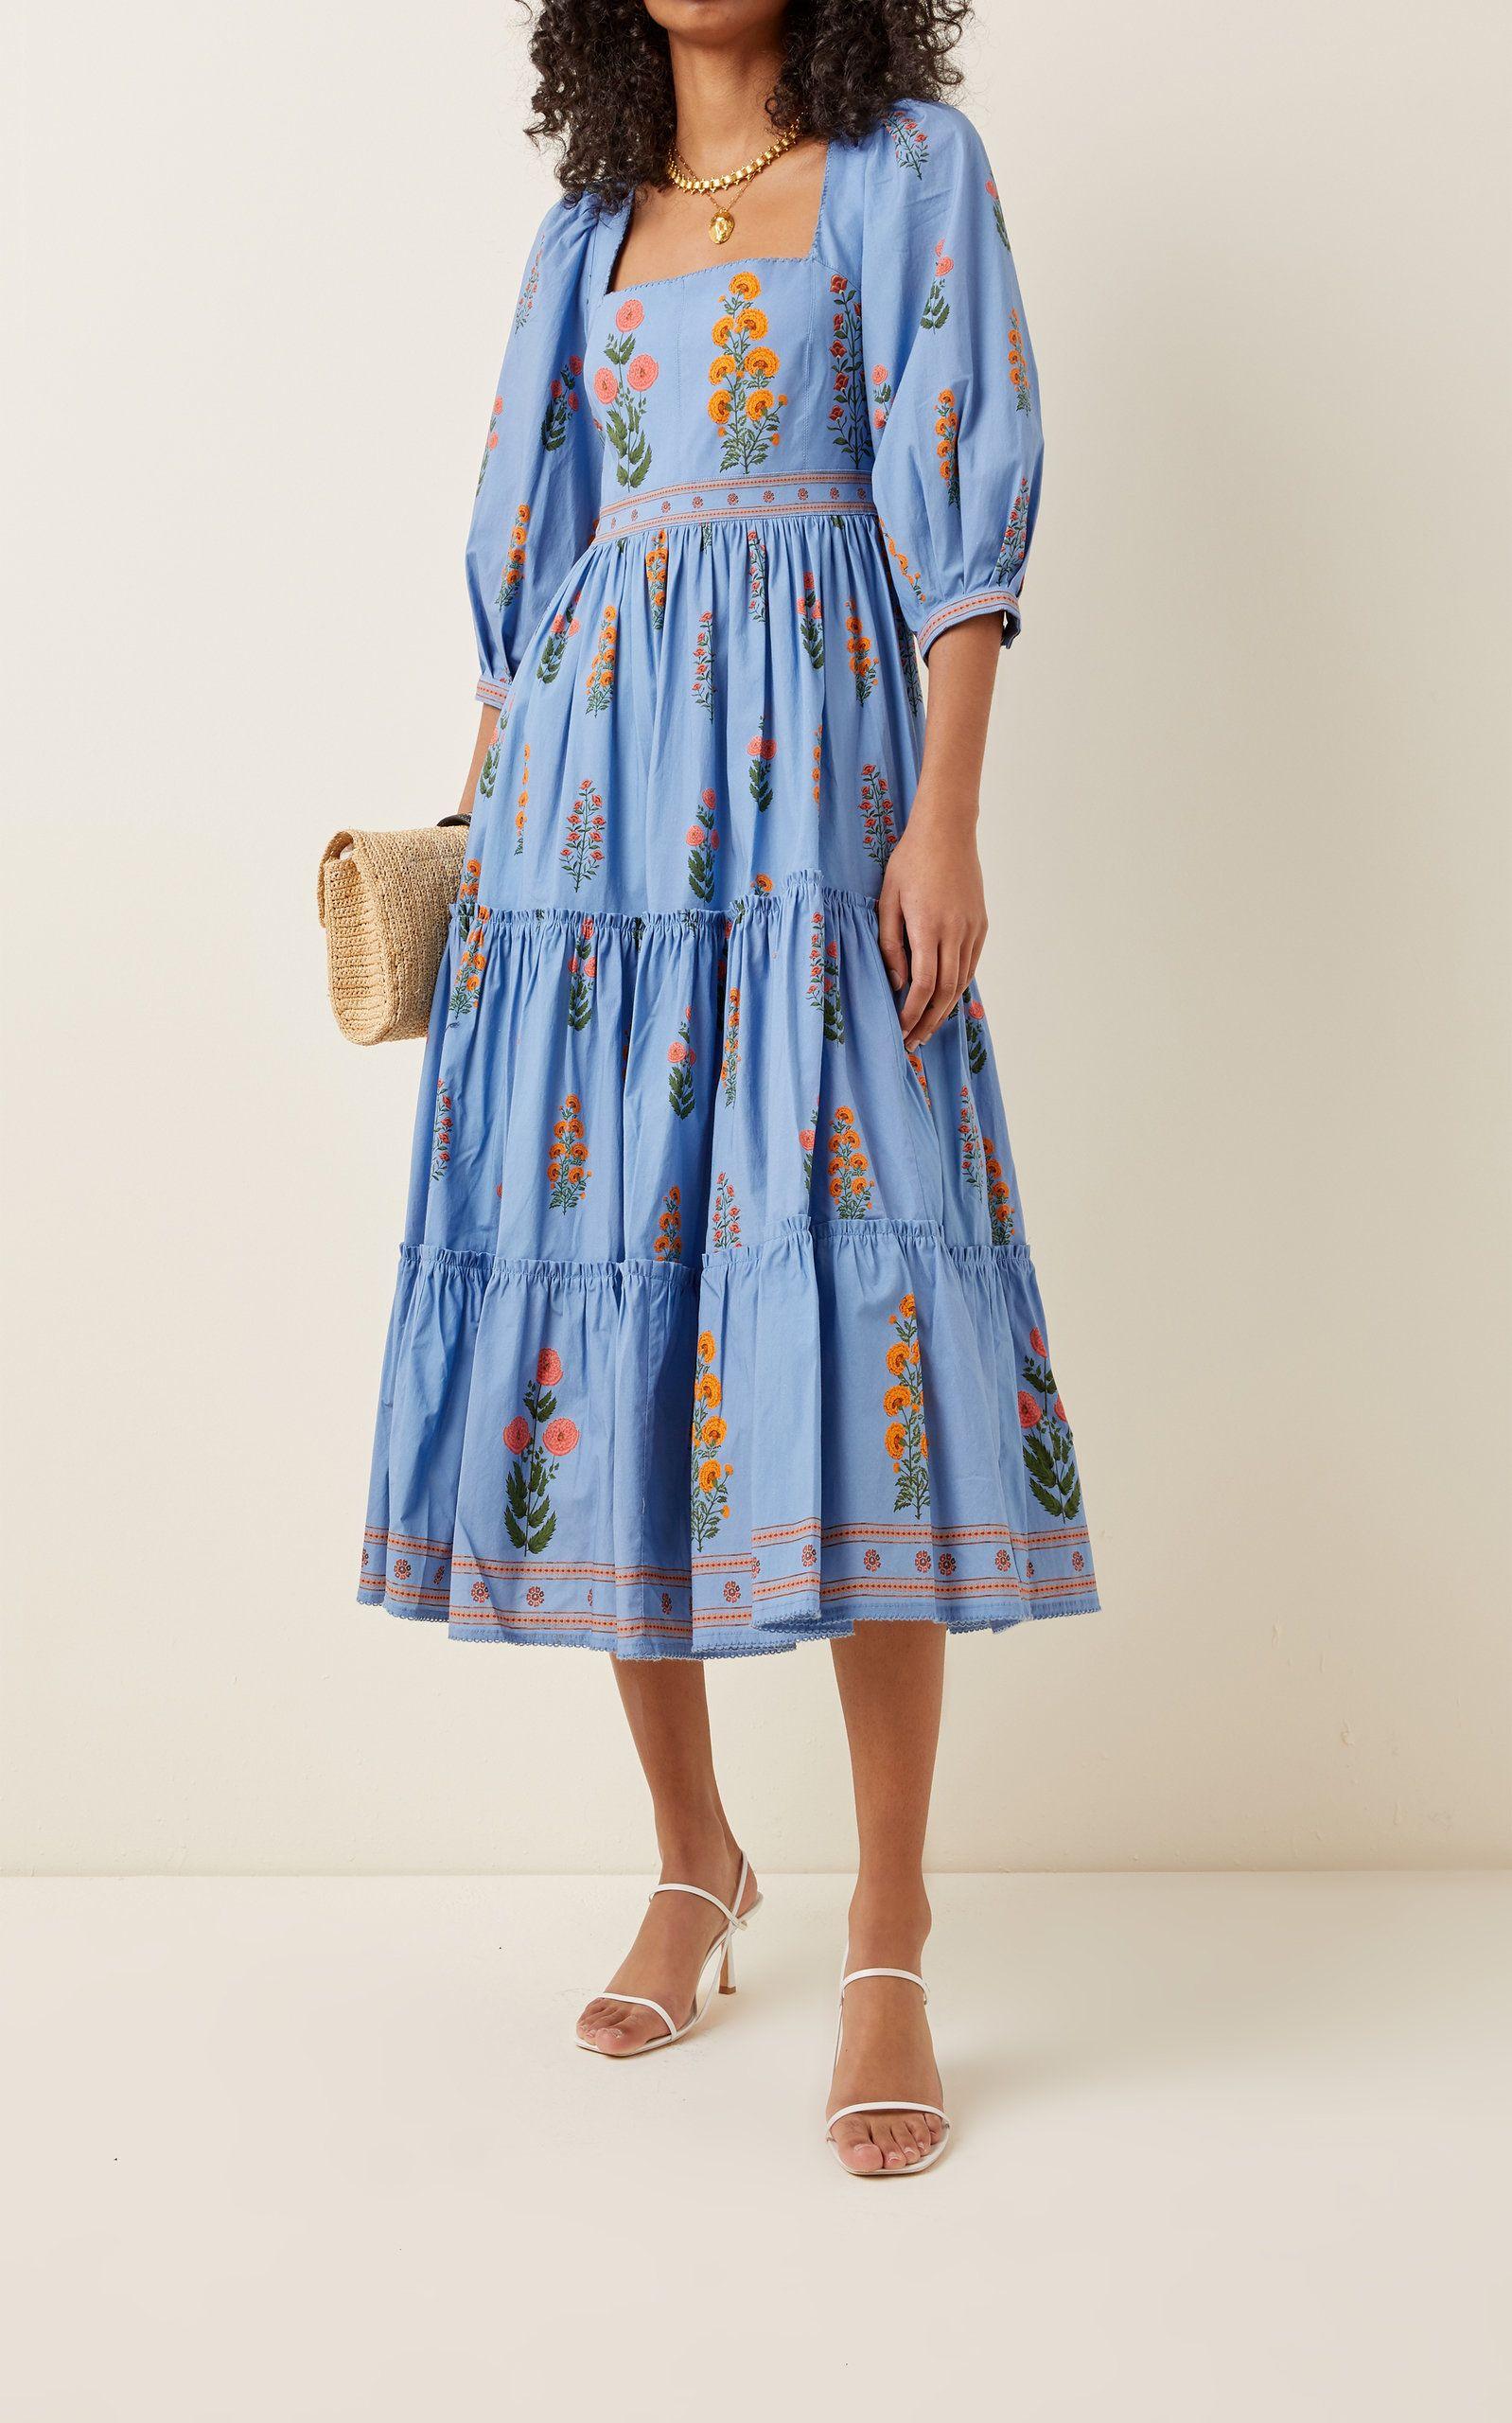 Miel Dahlia Cotton Poplin Midi Dress By Agua By Agua Bendita Moda Operandi In 2021 Cotton Dress Summer Midi Dress With Sleeves Midi Dress Casual [ 2560 x 1598 Pixel ]